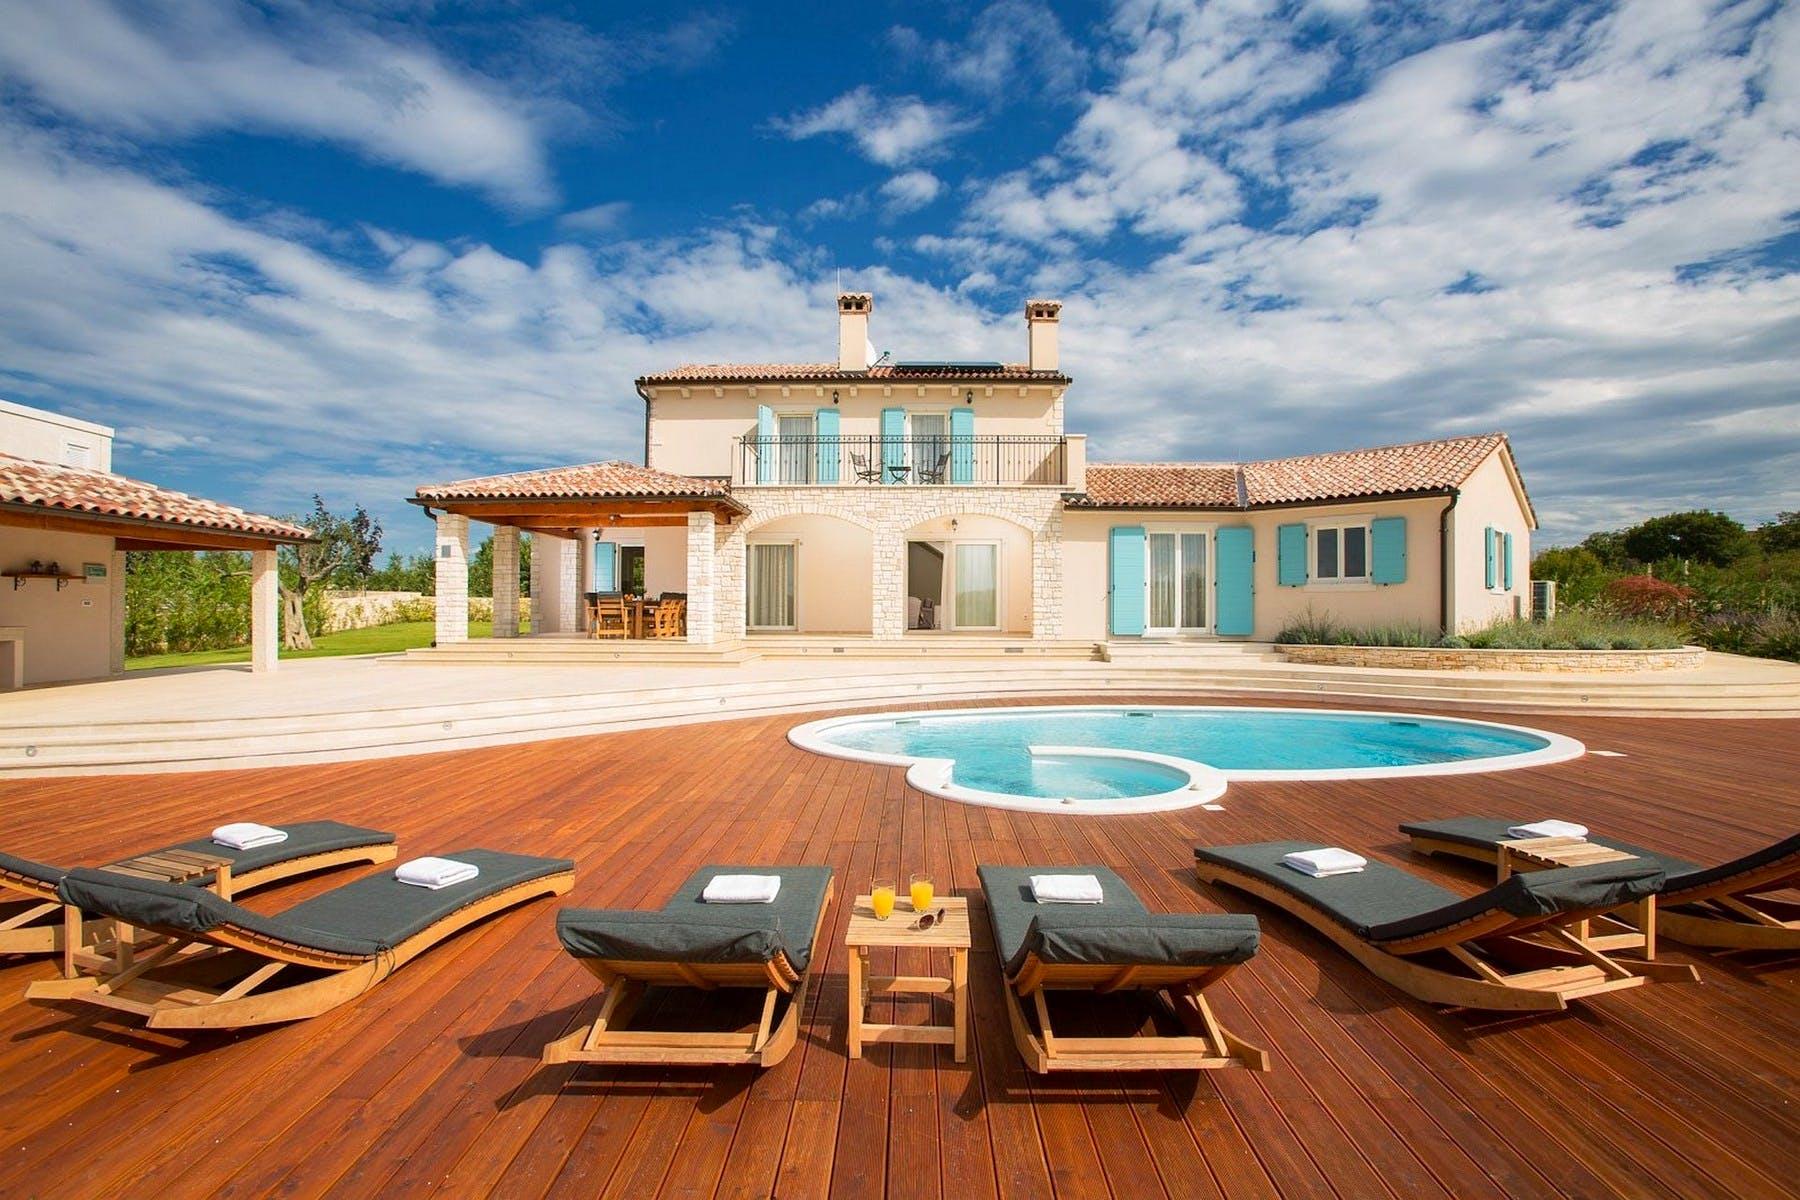 Luxury villa with swimming pool near Rovinj for sale